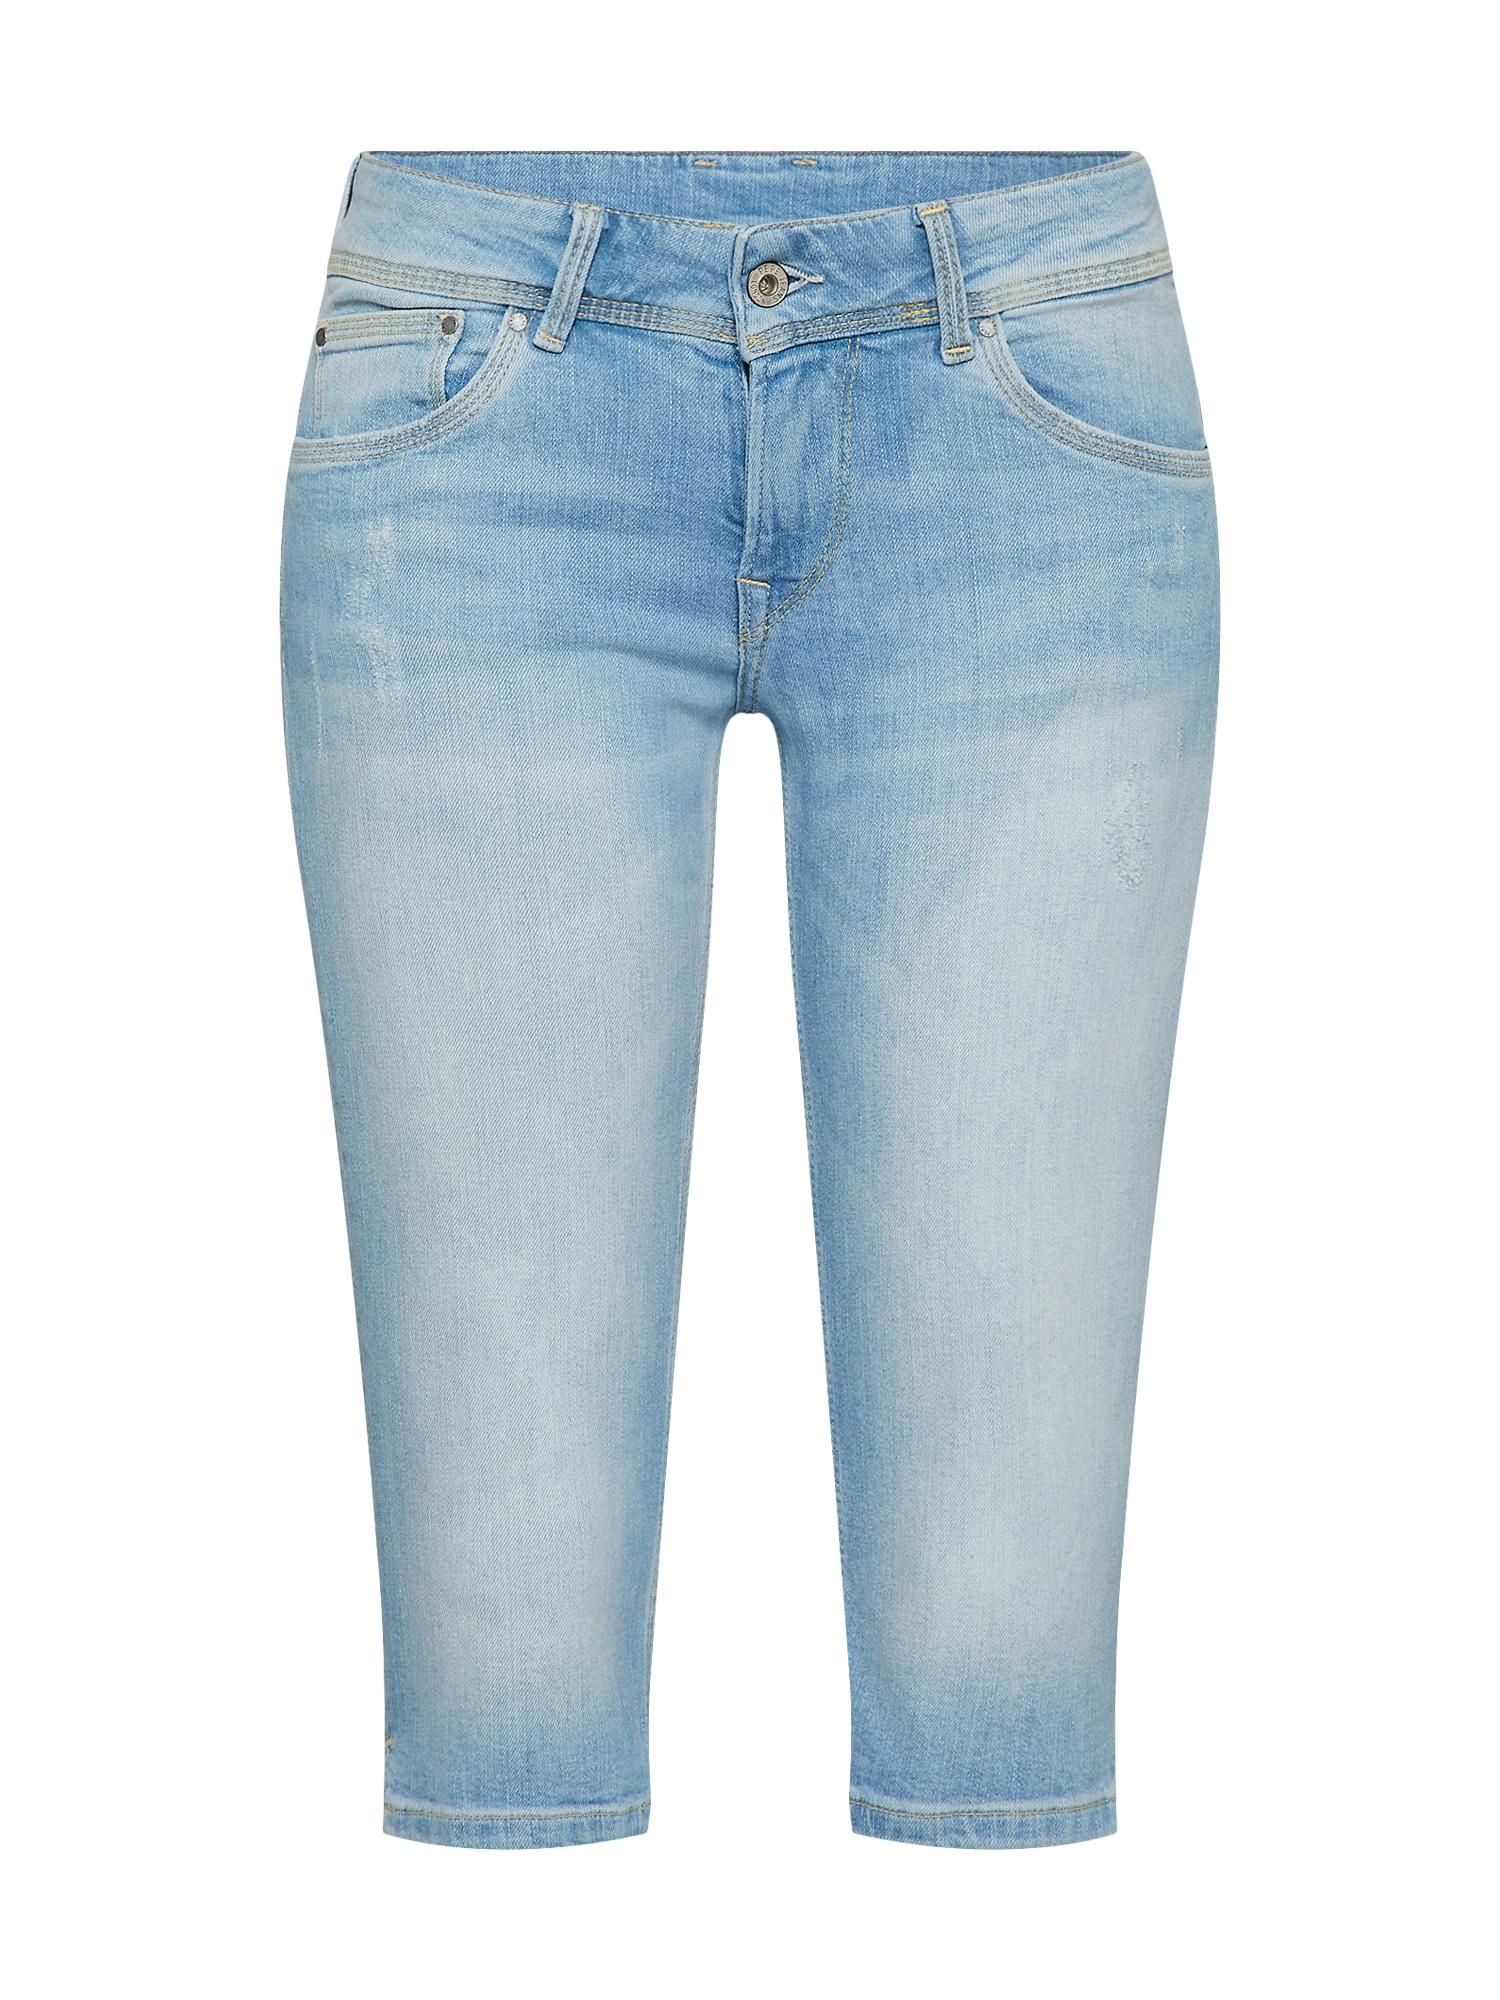 Pepe Jeans Dames Jeans SATURN CROP lichtblauw